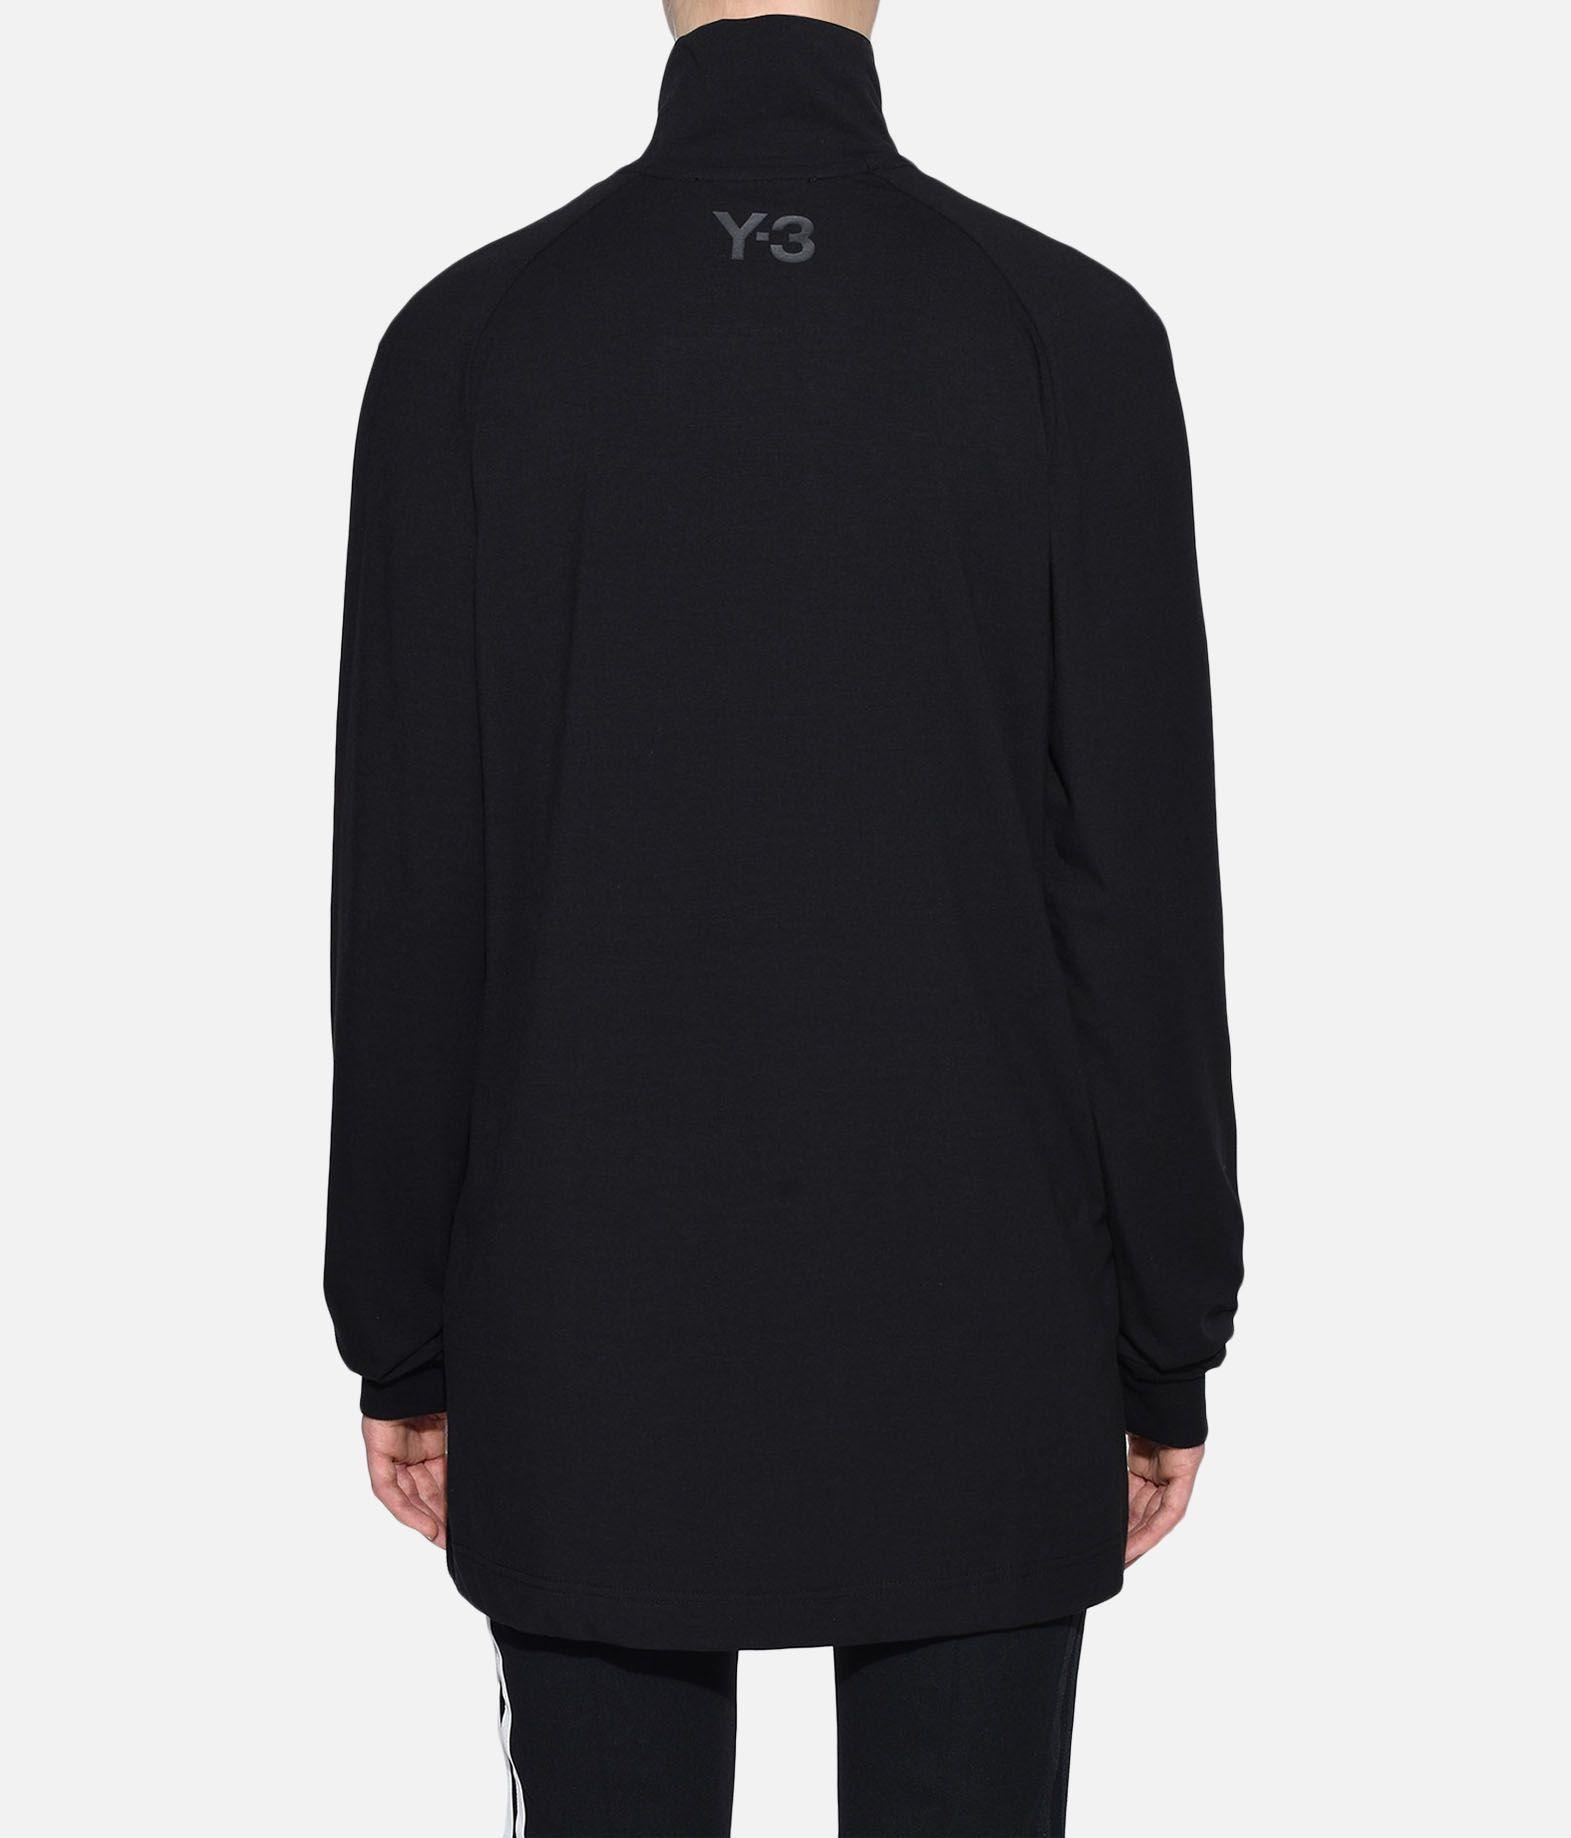 Y-3 Y-3 3-Stripes High Neck Tee Long sleeve t-shirt Woman d